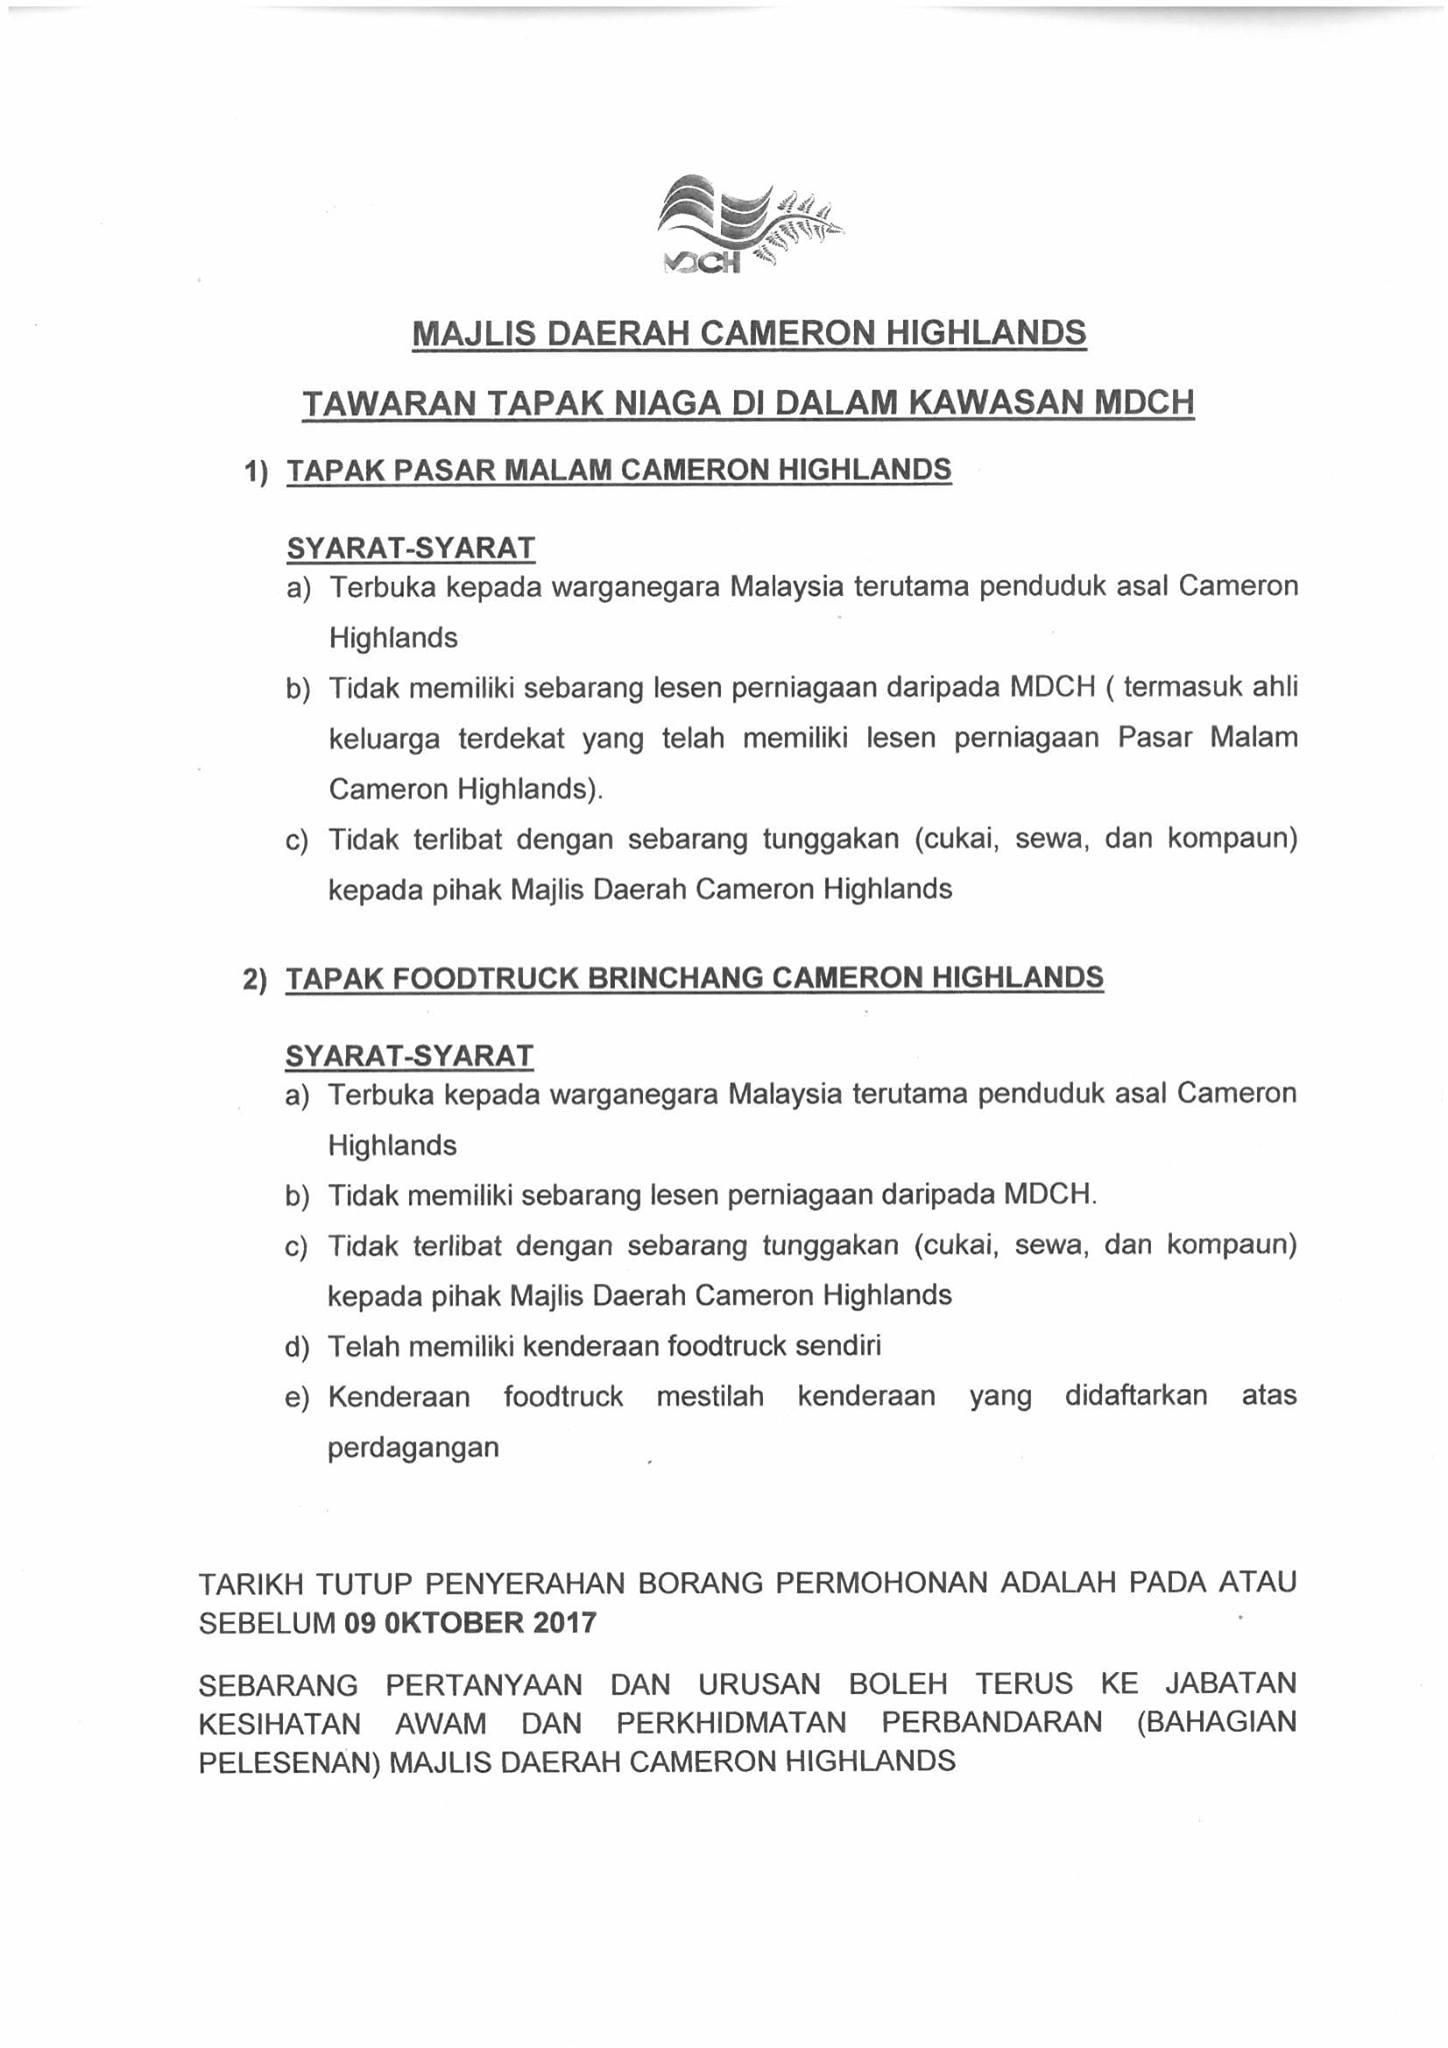 Tawaran Tapak Niaga Dalam Kawasan Mdch Tapak Pasar Malam Cameron Highlands Tapak Foodtruck Brinchang Portal Rasmi Majlis Daerah Cameron Highlands Mdch